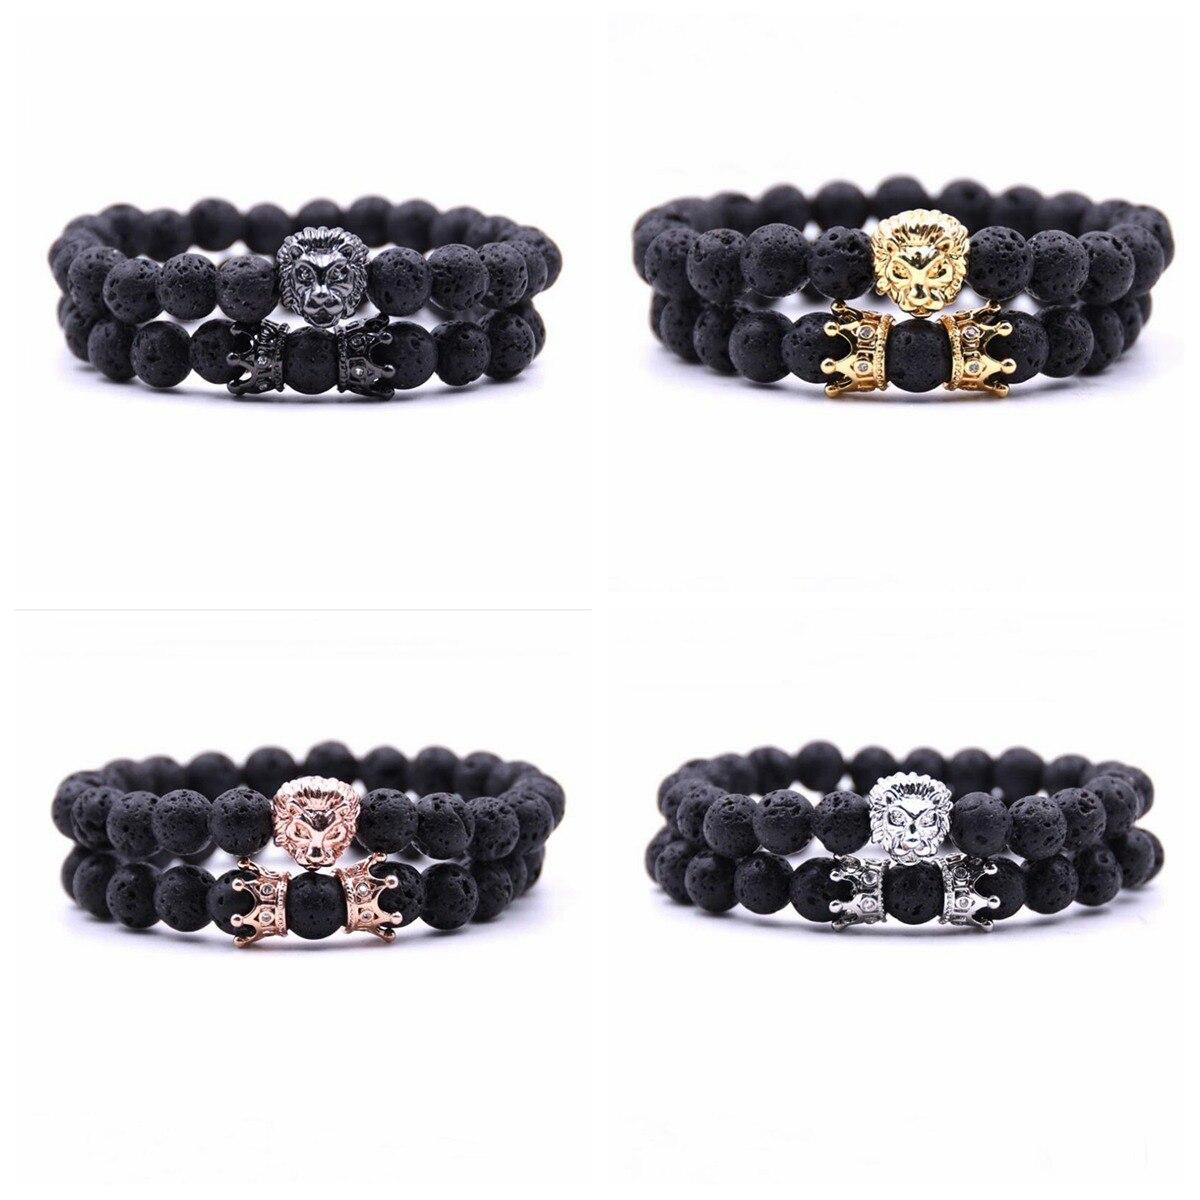 2pcs 8mm Natural Lava stone Bracelet Copper Crown Jewelry Men jewelry Elasticity Bracelets Women Chakra Bangl